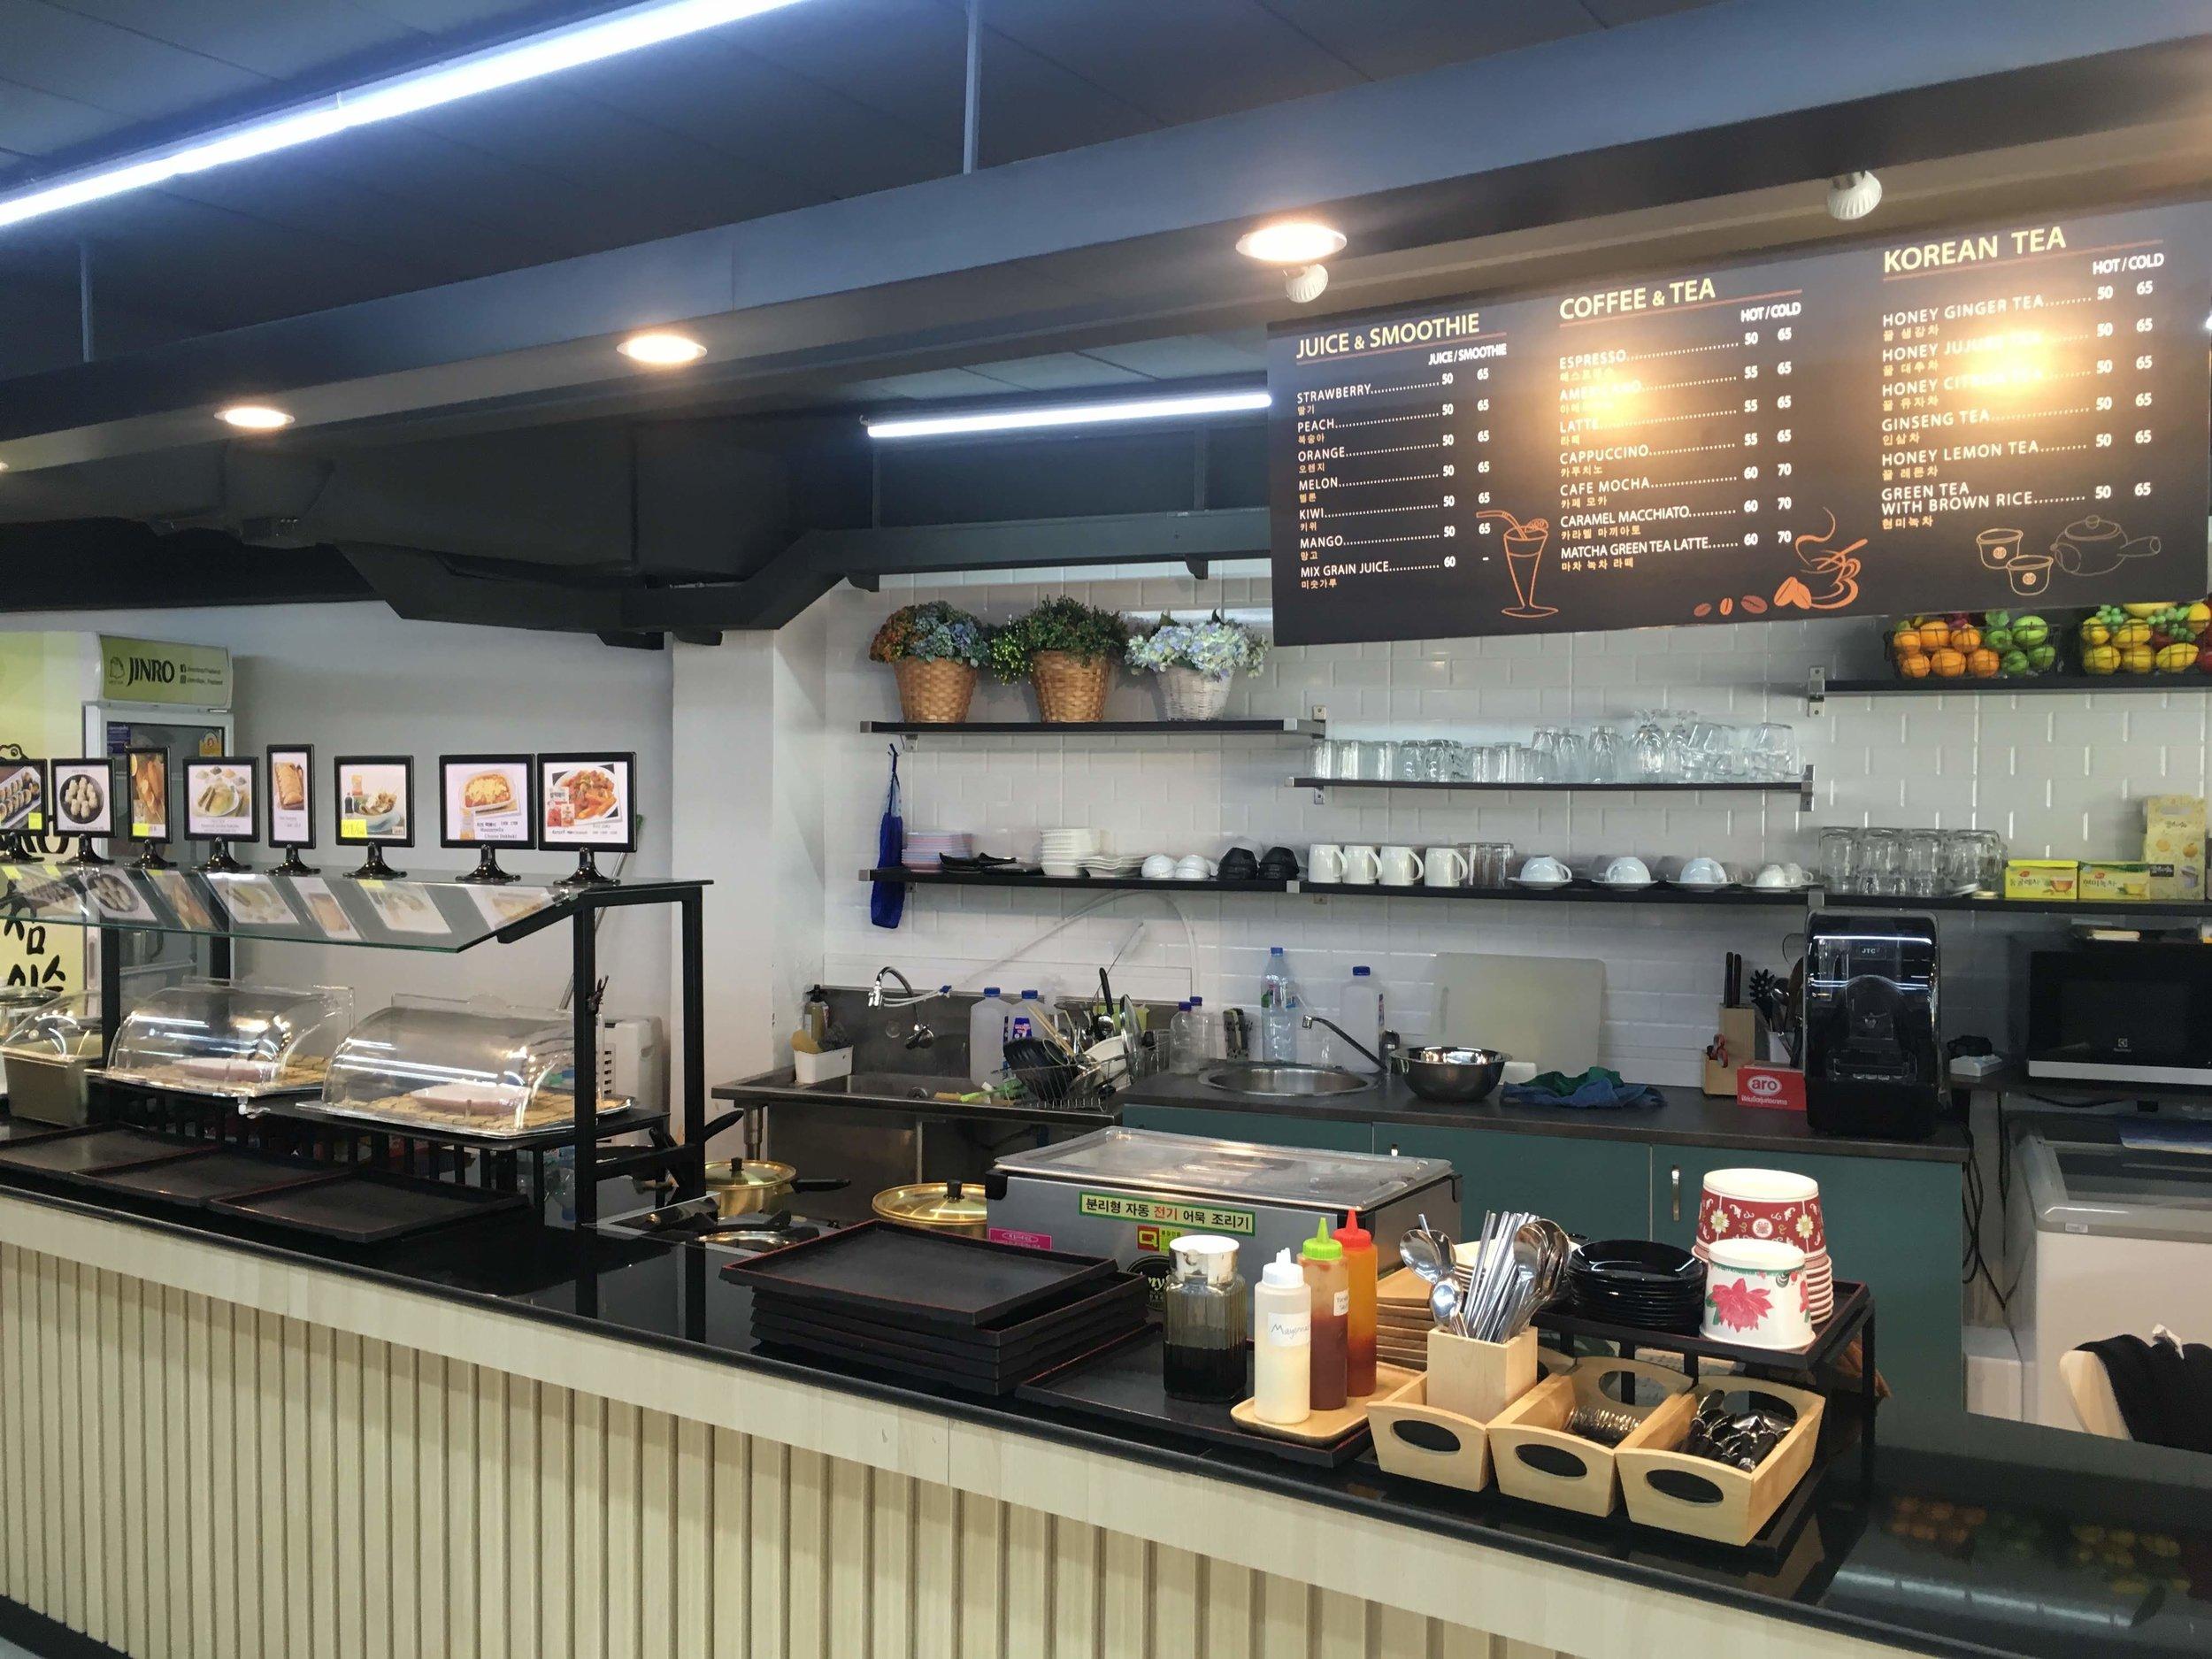 Korean food and snacks